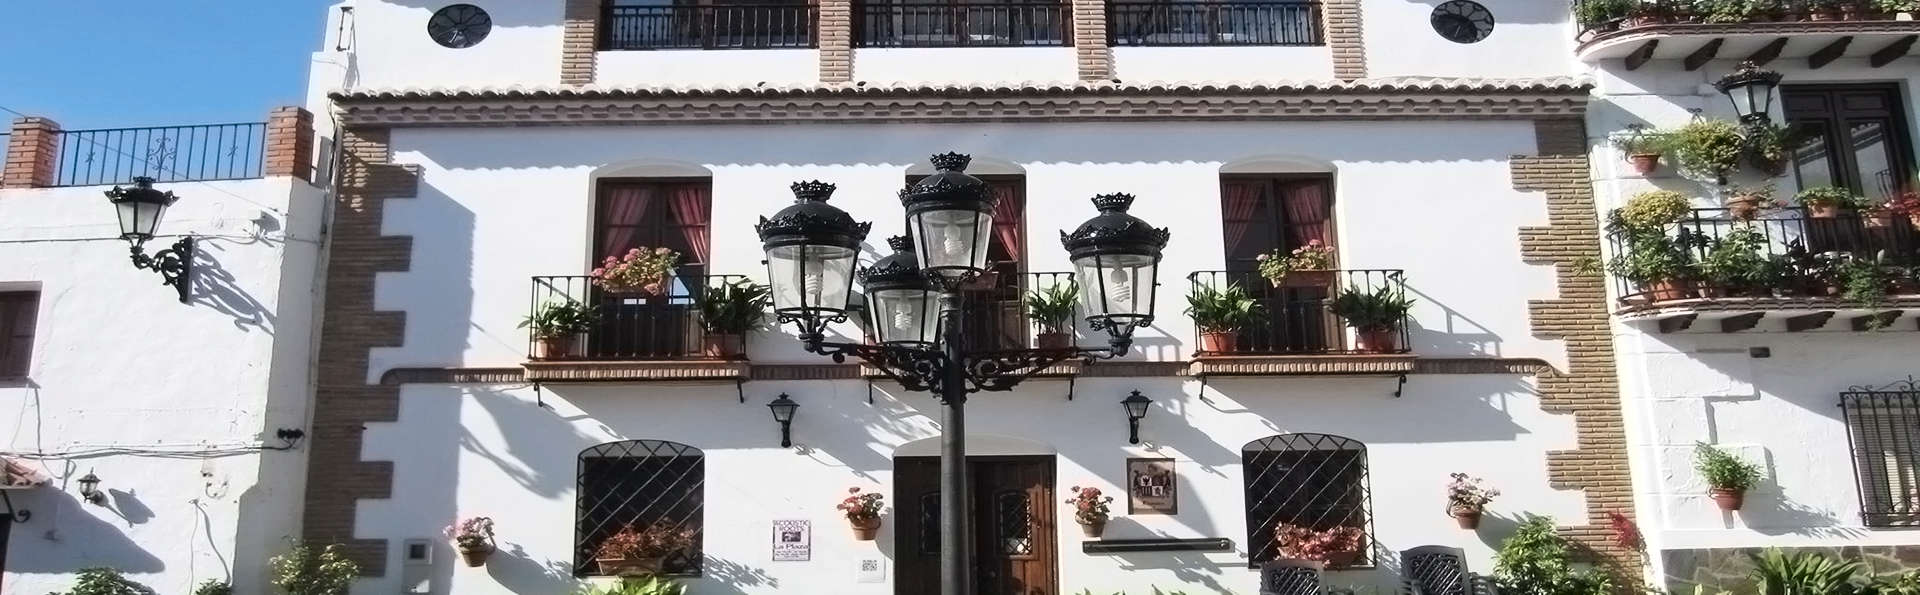 Hotel Posada la Plaza - EDIT_EXT_VIEW_6.jpg